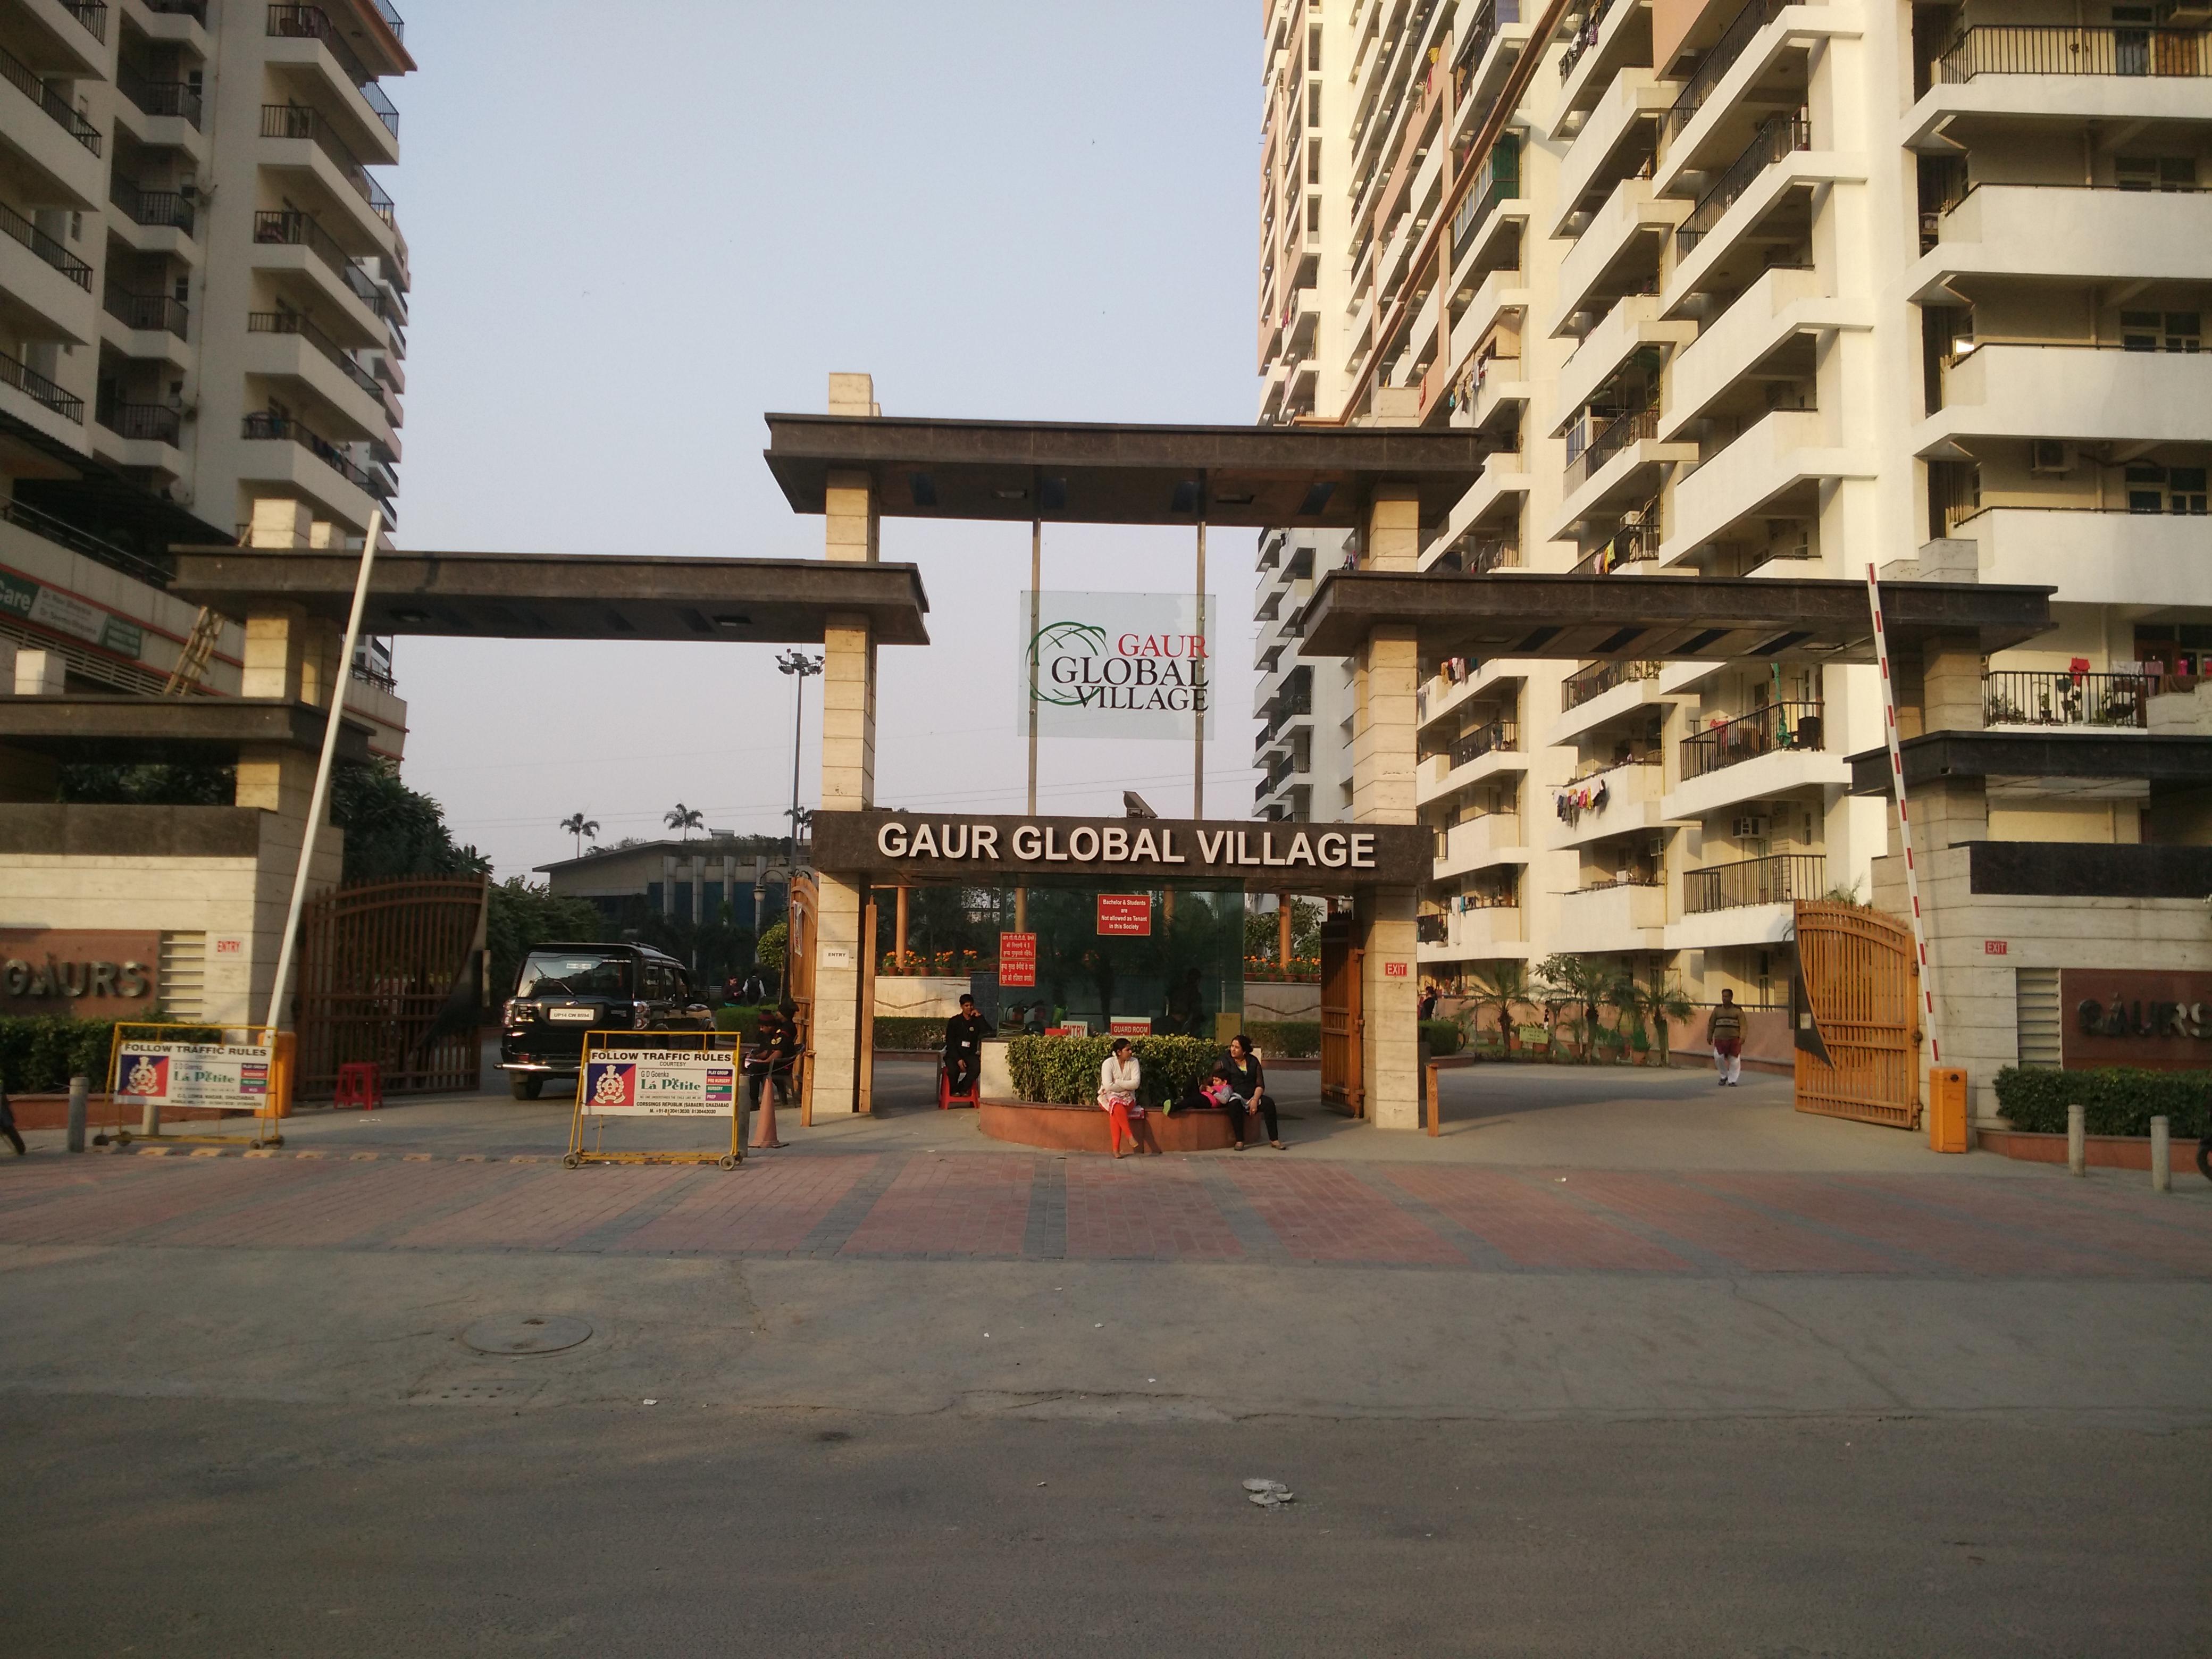 Gaur Global Village